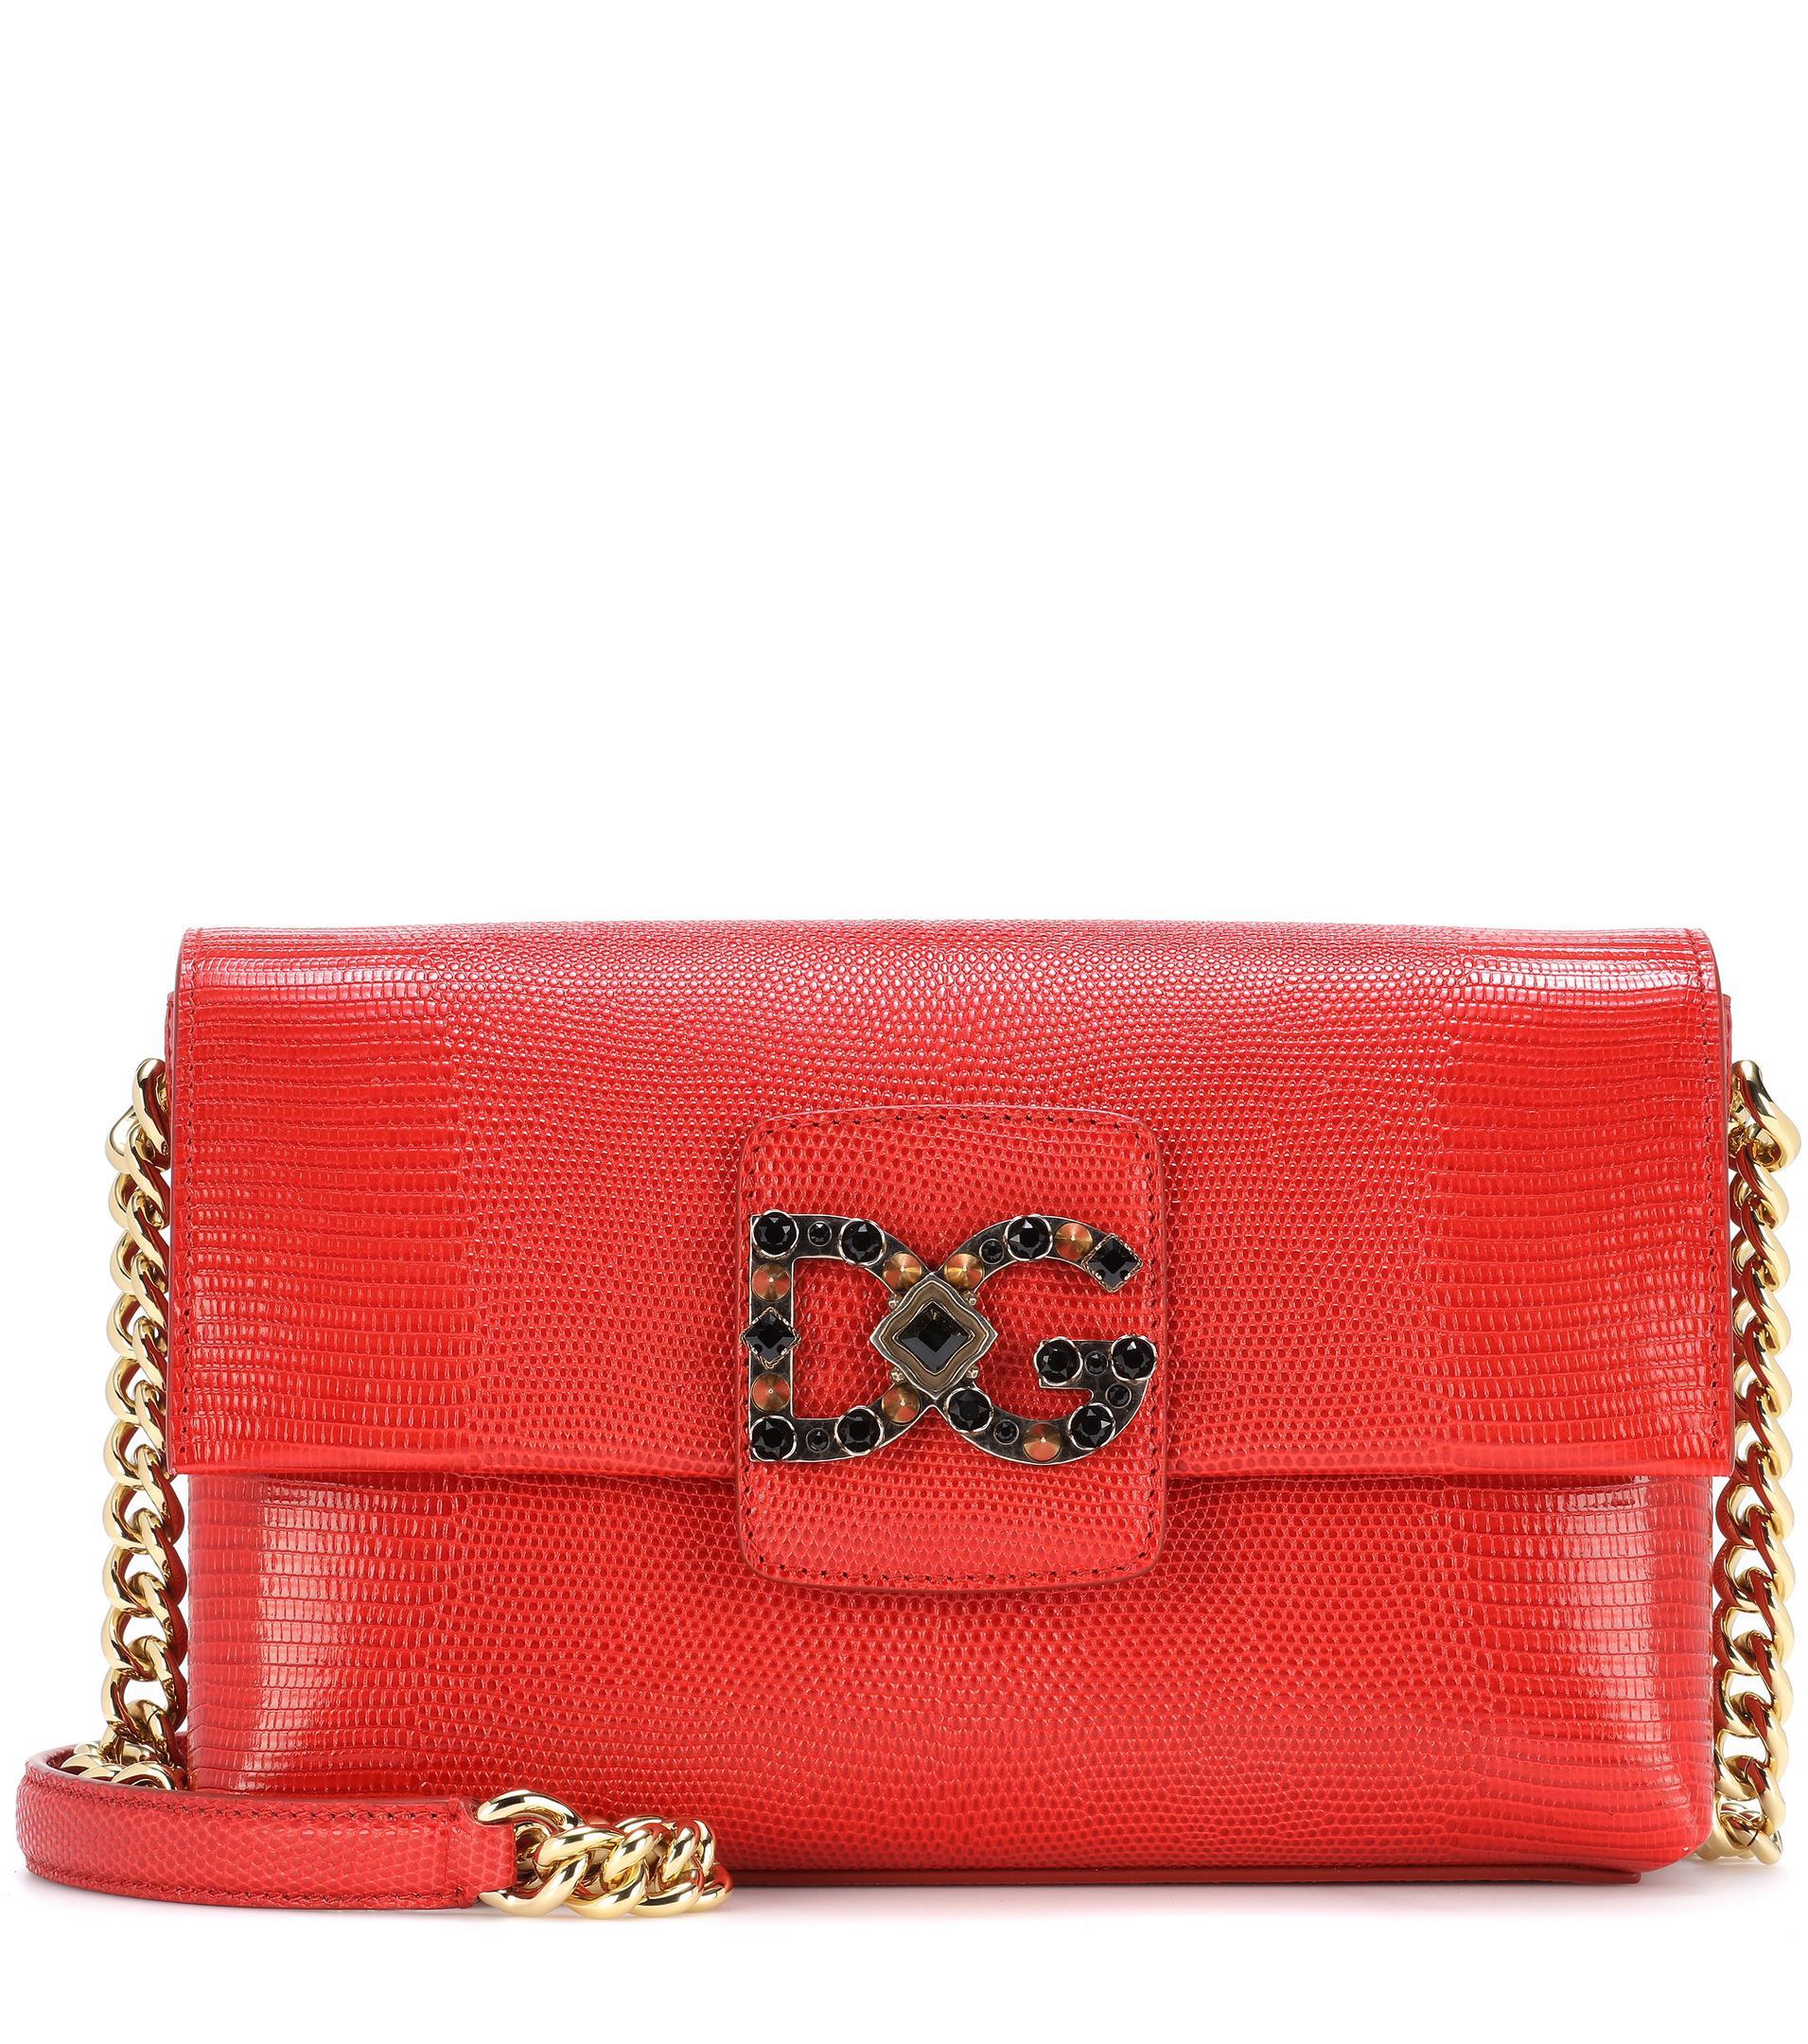 5eab35c302 Lyst - Dolce   Gabbana Dg Millennials Leather Shoulder Bag in Red